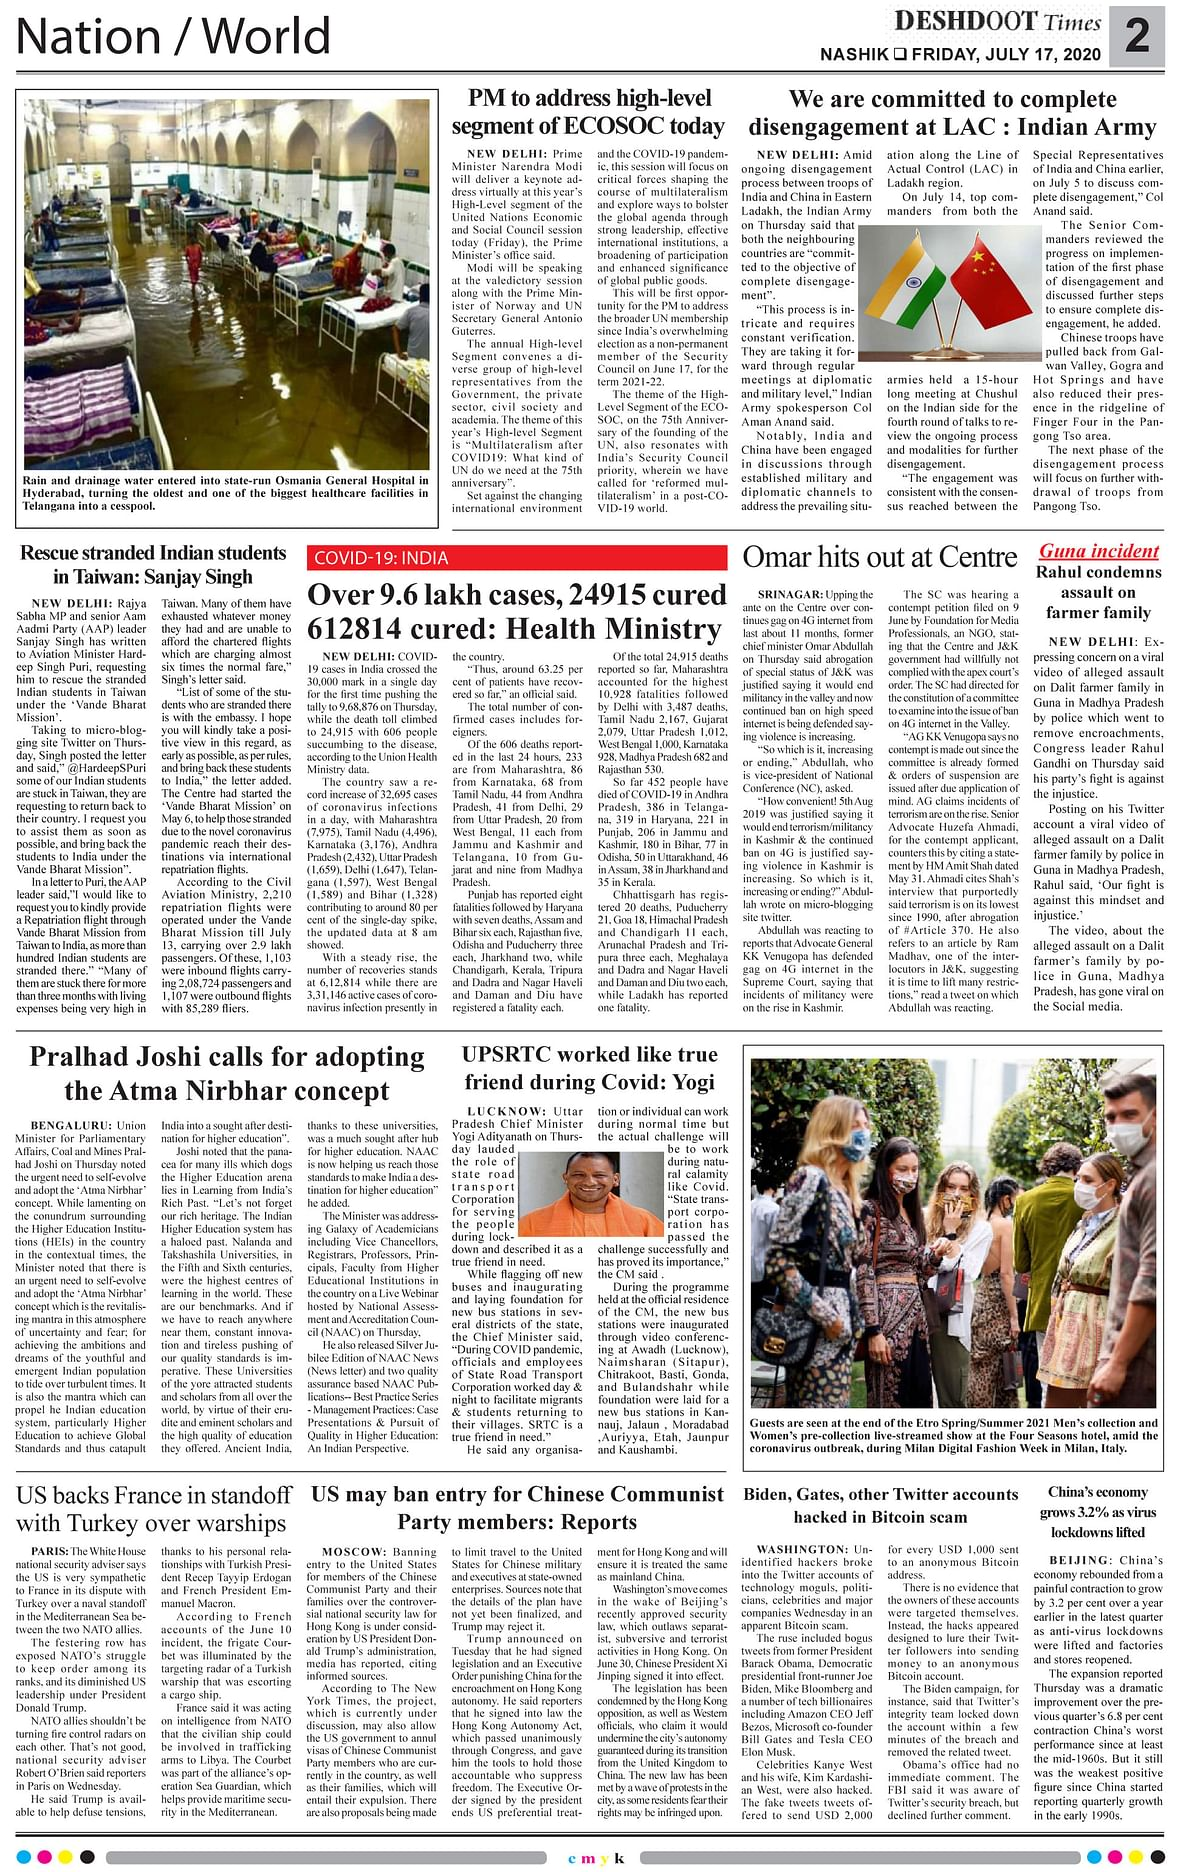 Deshdoot Times E Paper, 17 July 2020